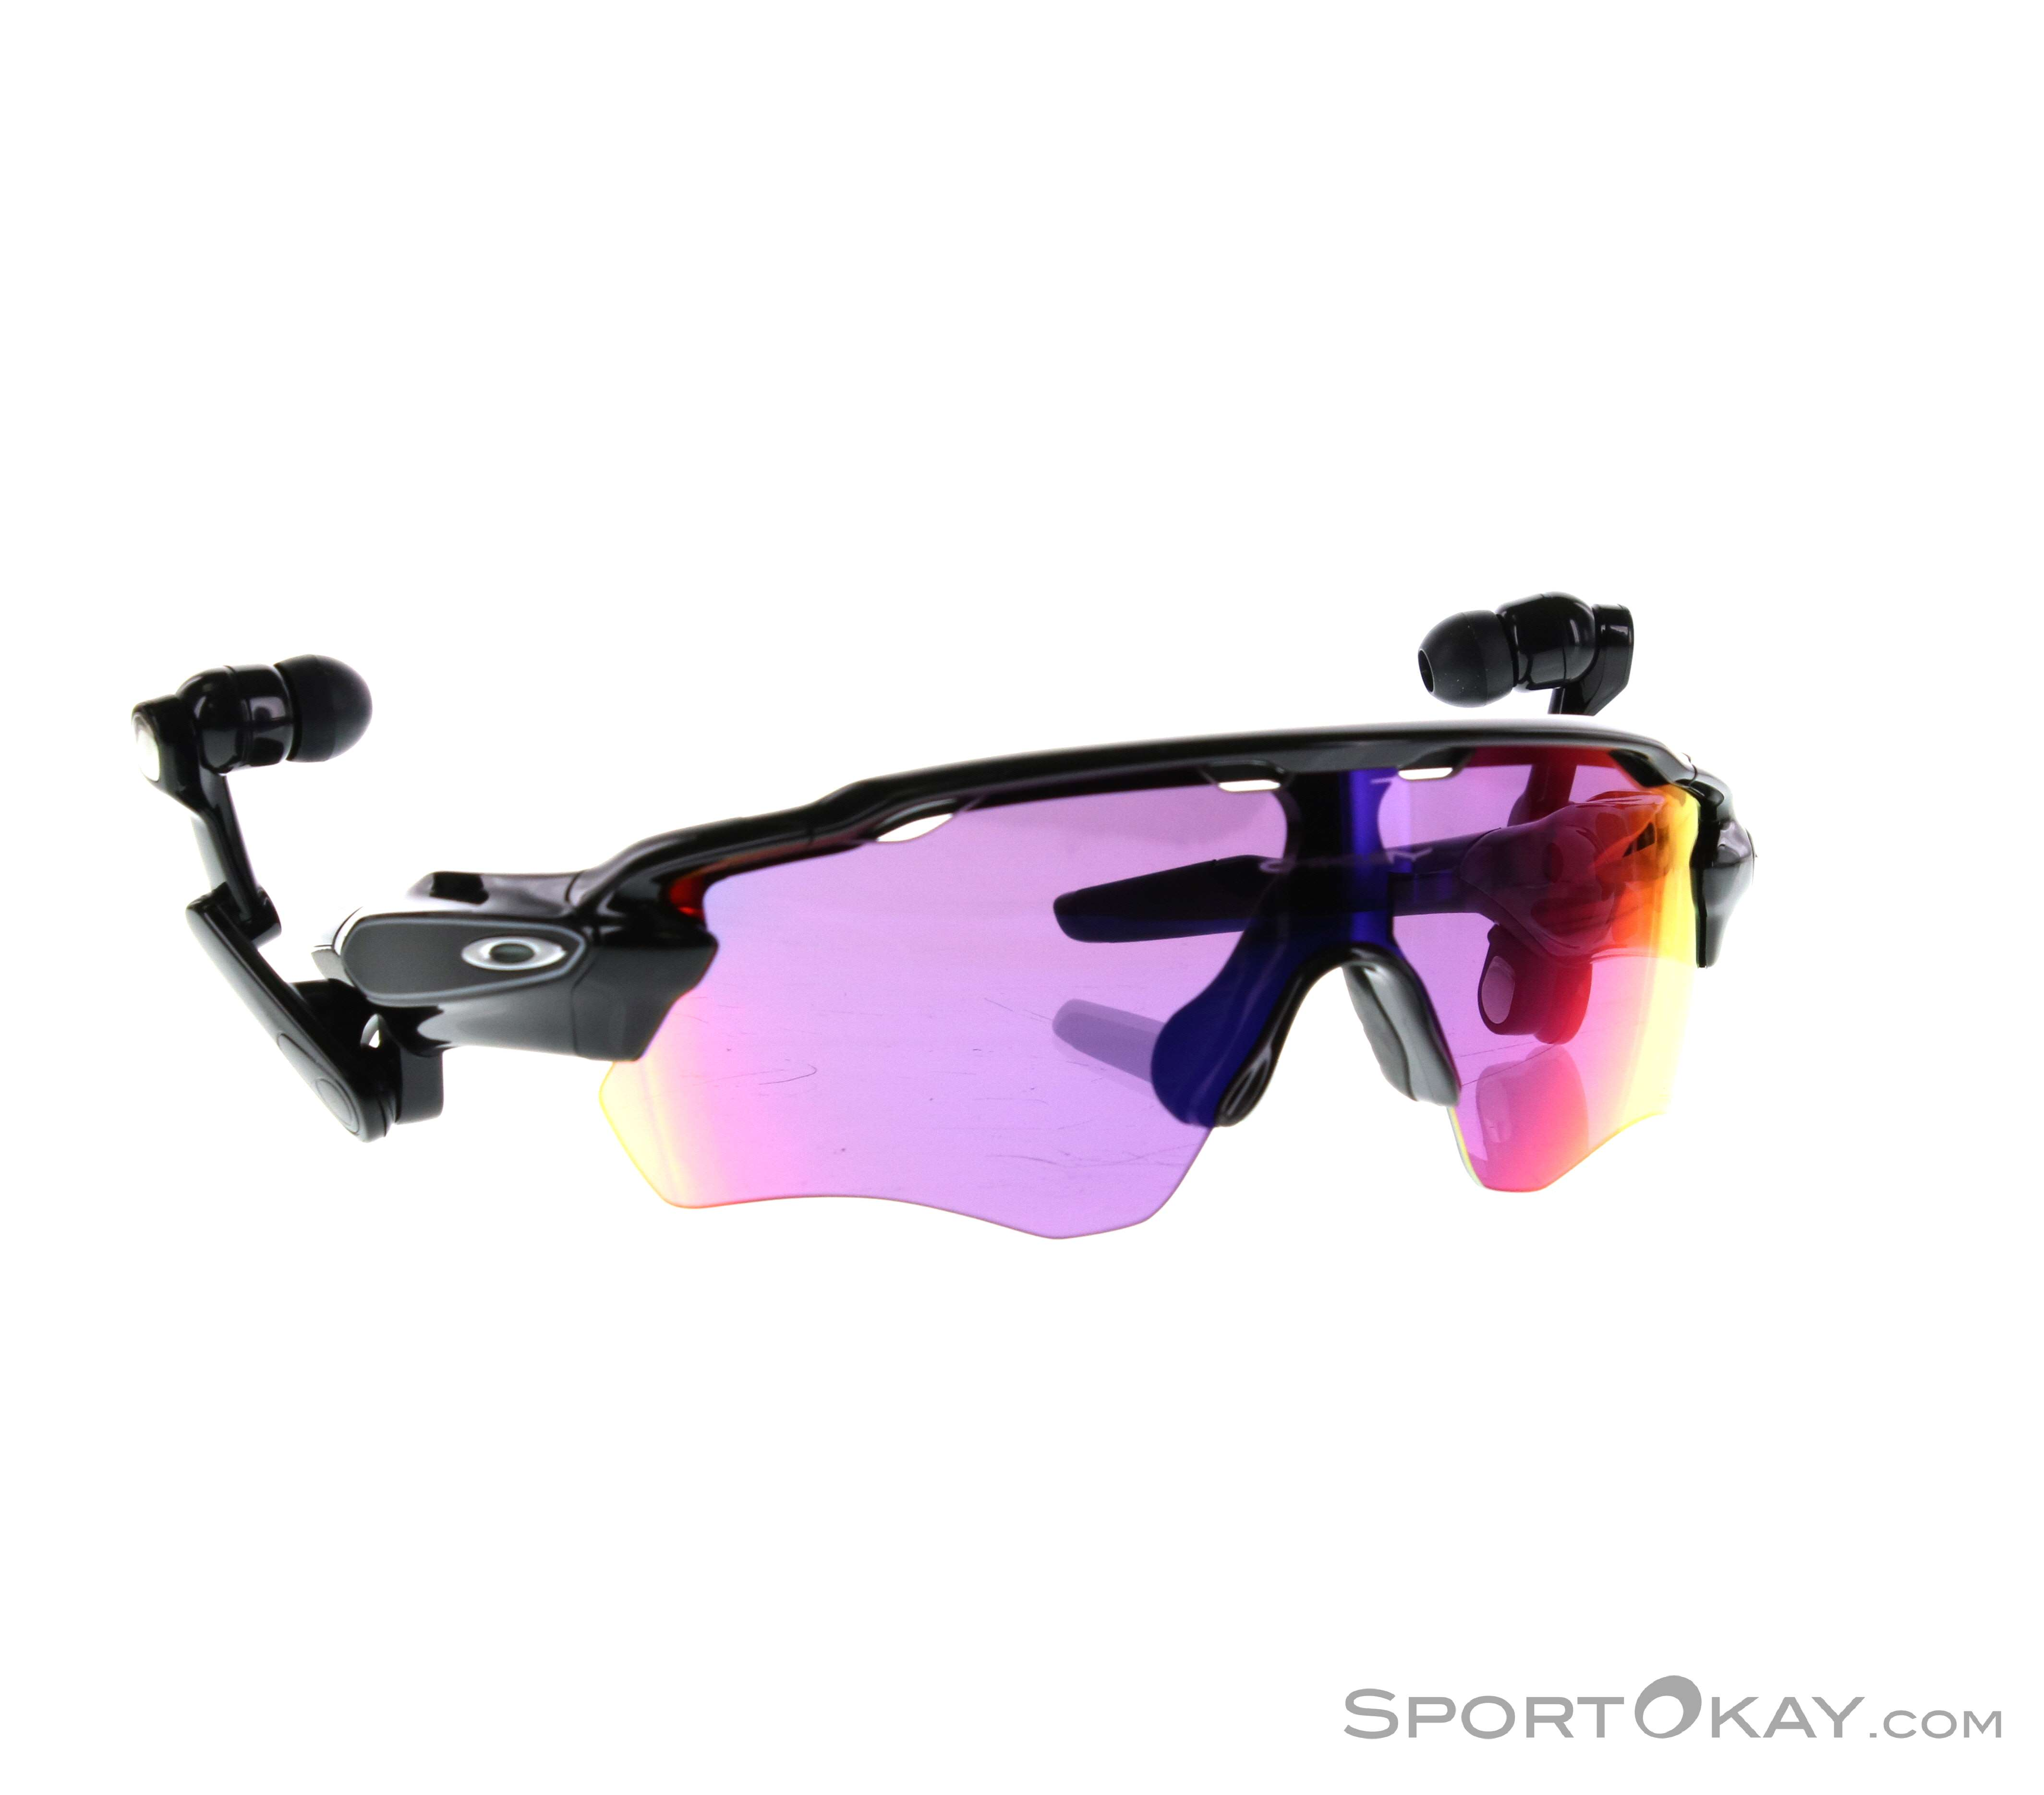 Oakley Radar Pace Prizm Road Sportbrille, Oakley, Schwarz, , Herren, 0064-10091, 5637521155, 888392223067, N1-01.jpg